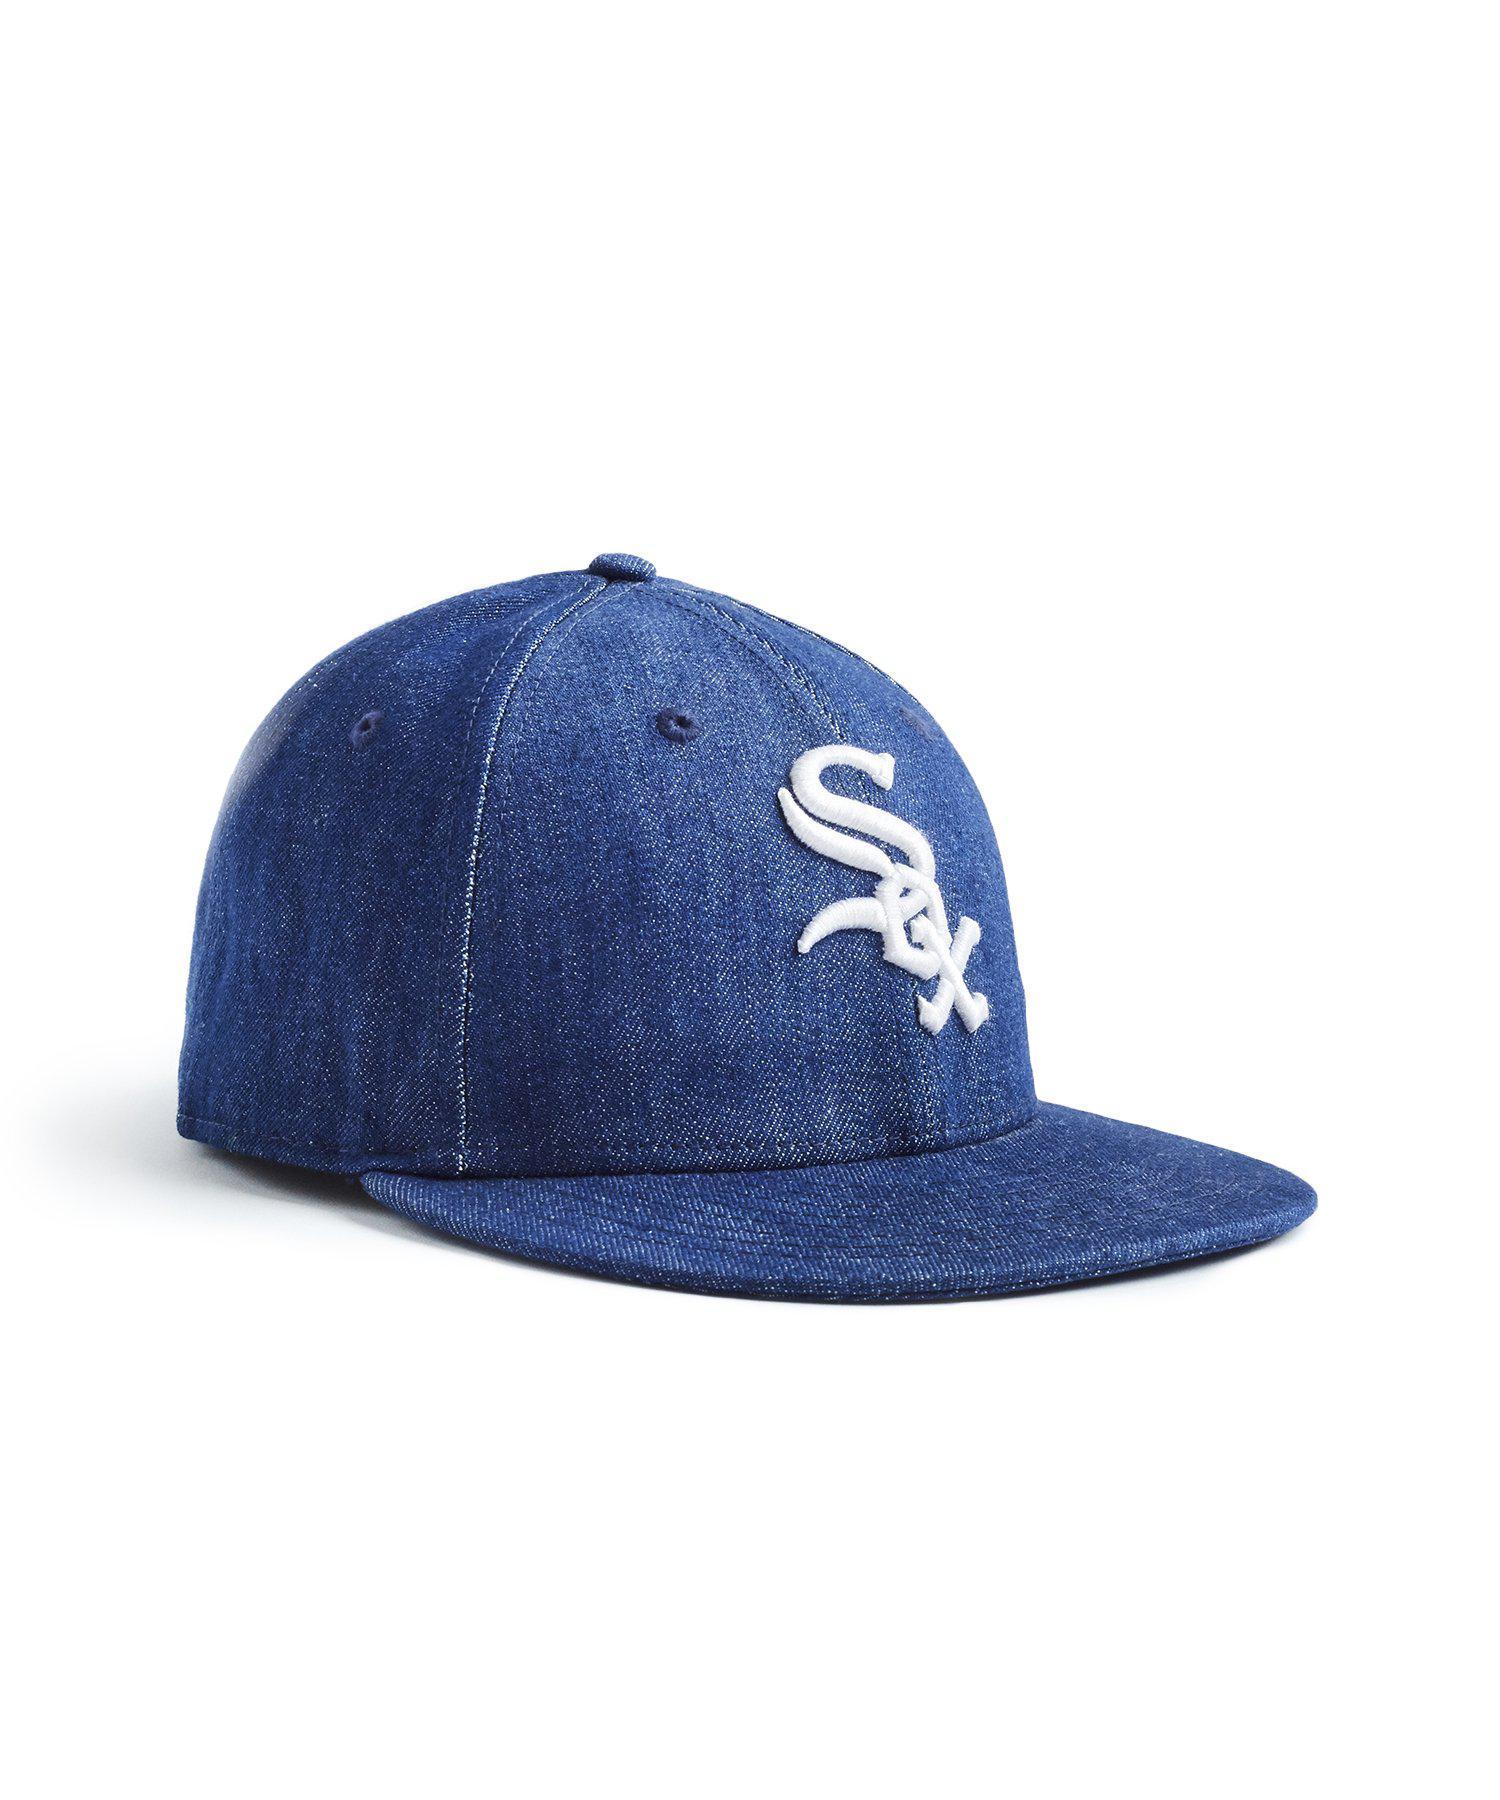 new concept 5a500 fd61e NEW ERA HATS Mlb Chicago White Sox Cap In Cone Denim in Blue for Men ...